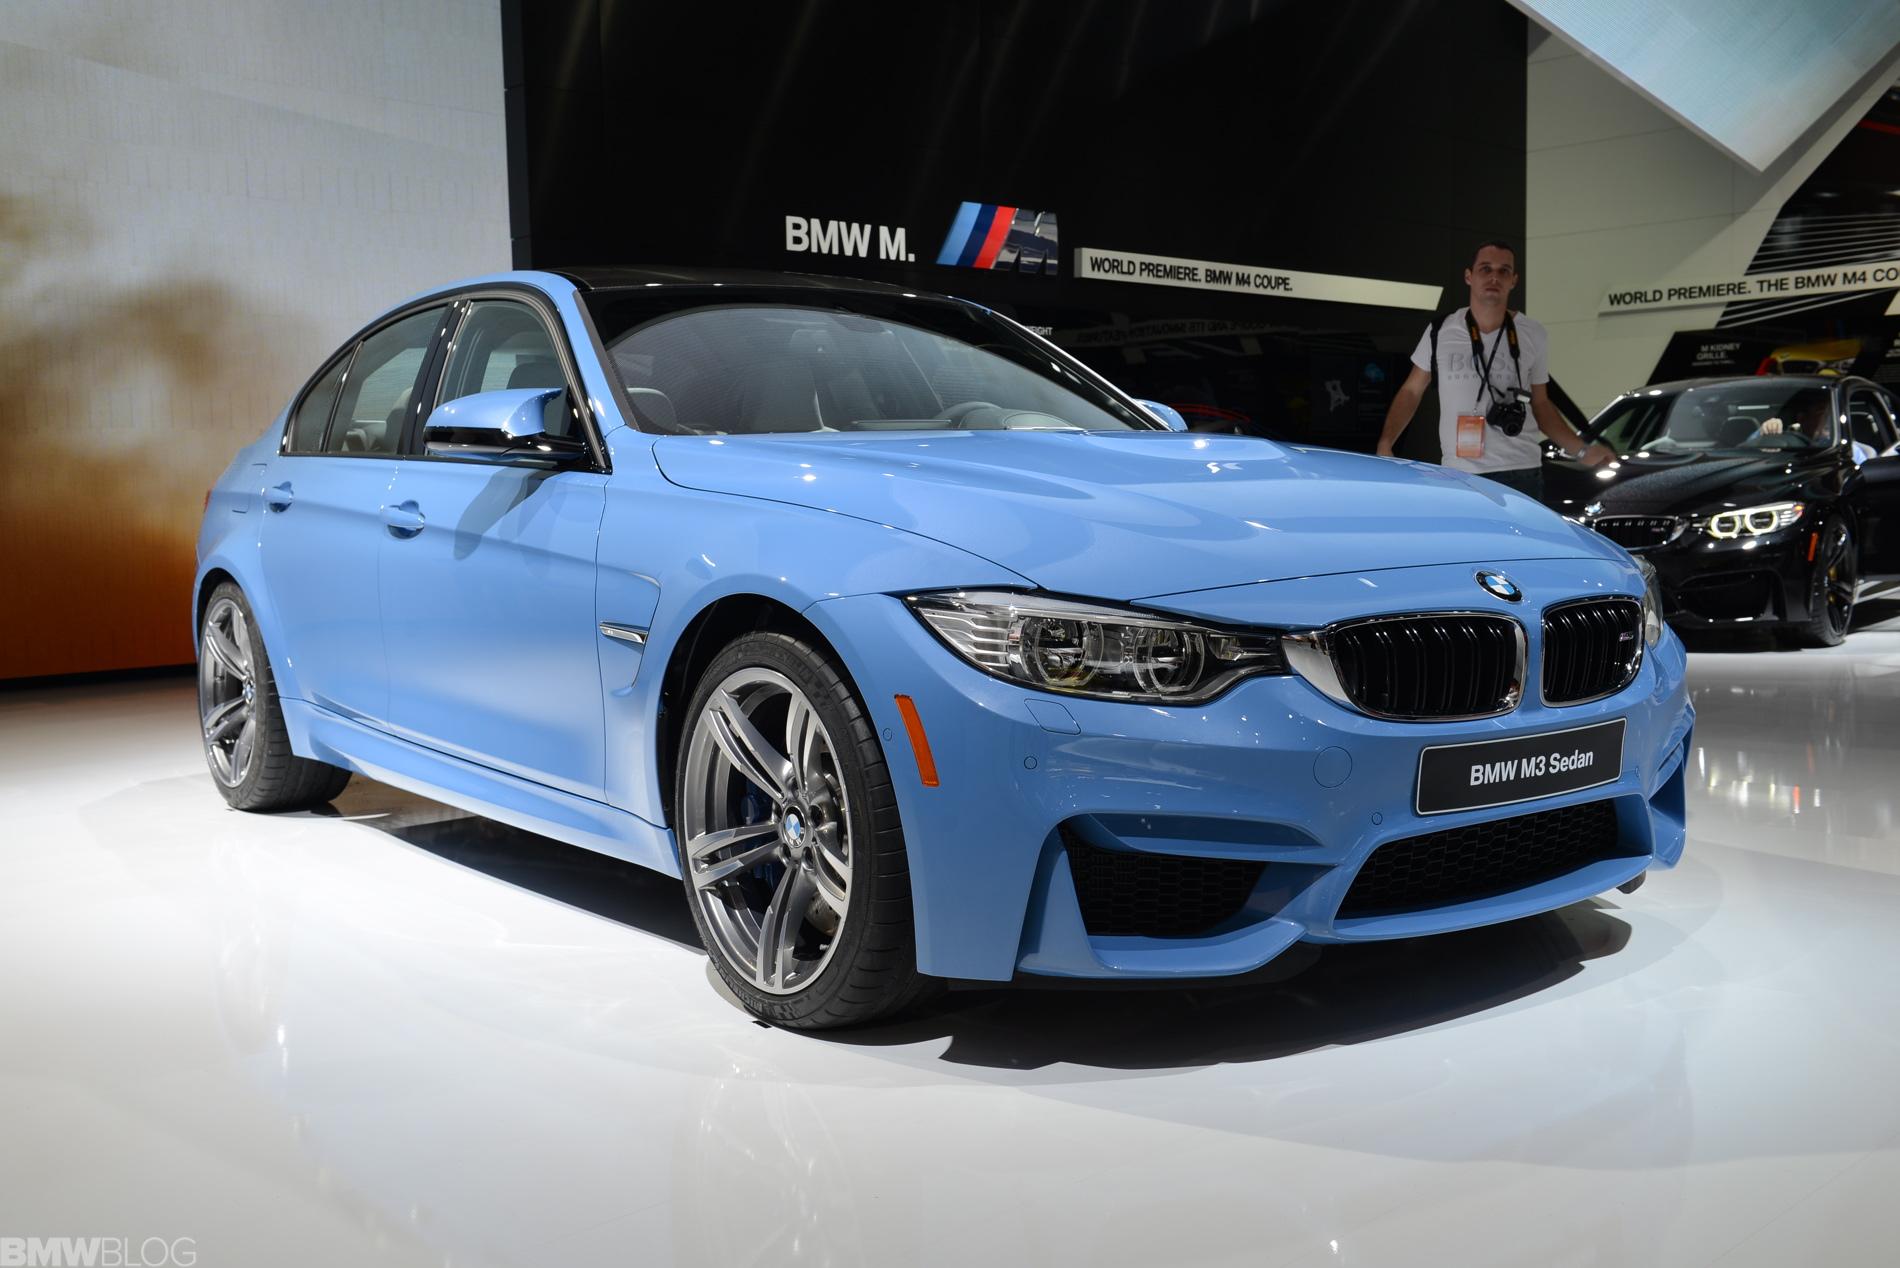 VIDEO: BMW M3 in Yas Marina Blue